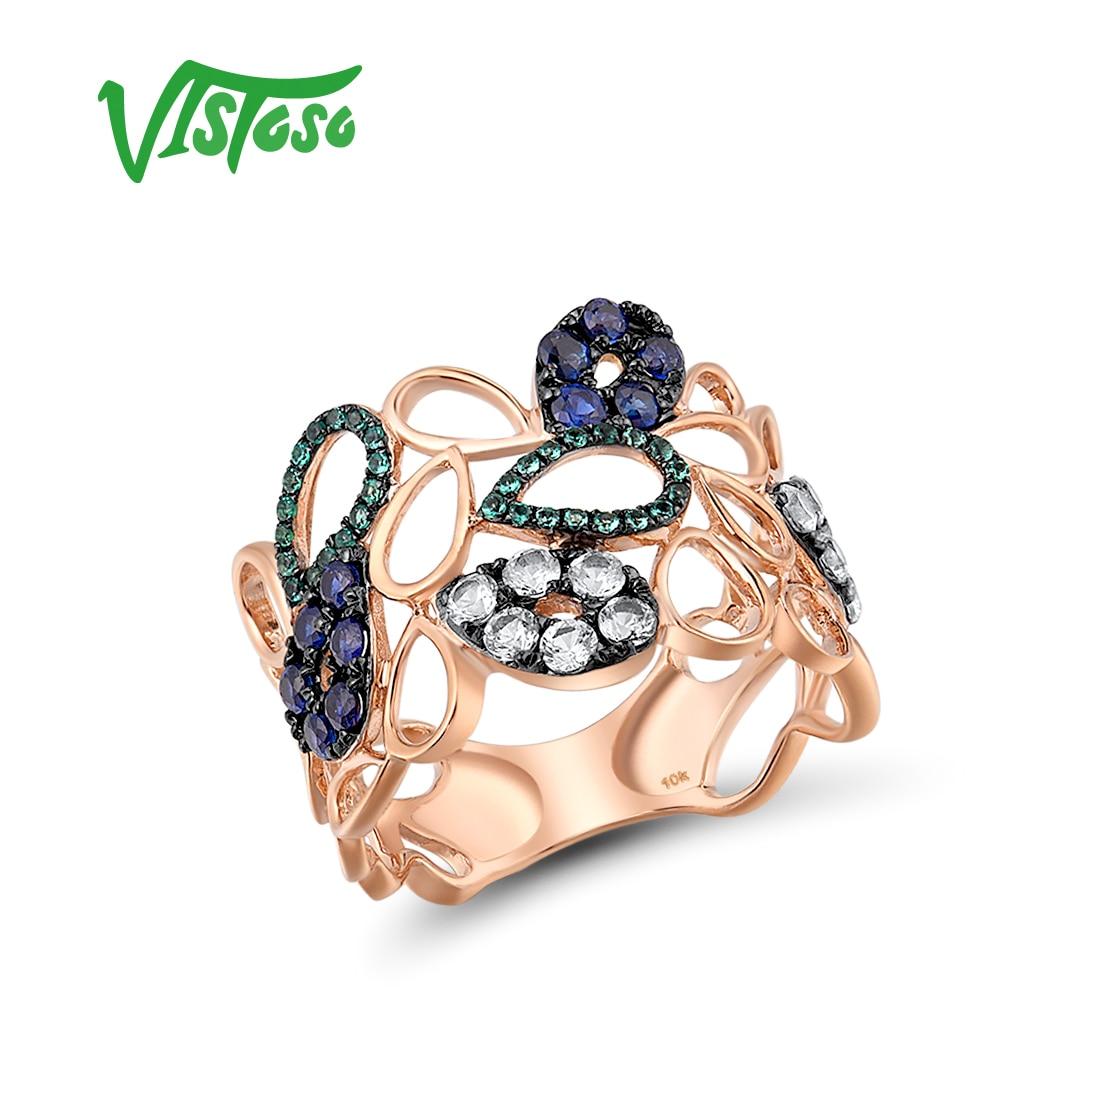 VISTOSO-خاتم من الذهب الوردي عيار 375 عيار 9 قيراط من الياقوت الأزرق والزمرد والياقوت الأبيض والمجوهرات الراقية المتلألئة